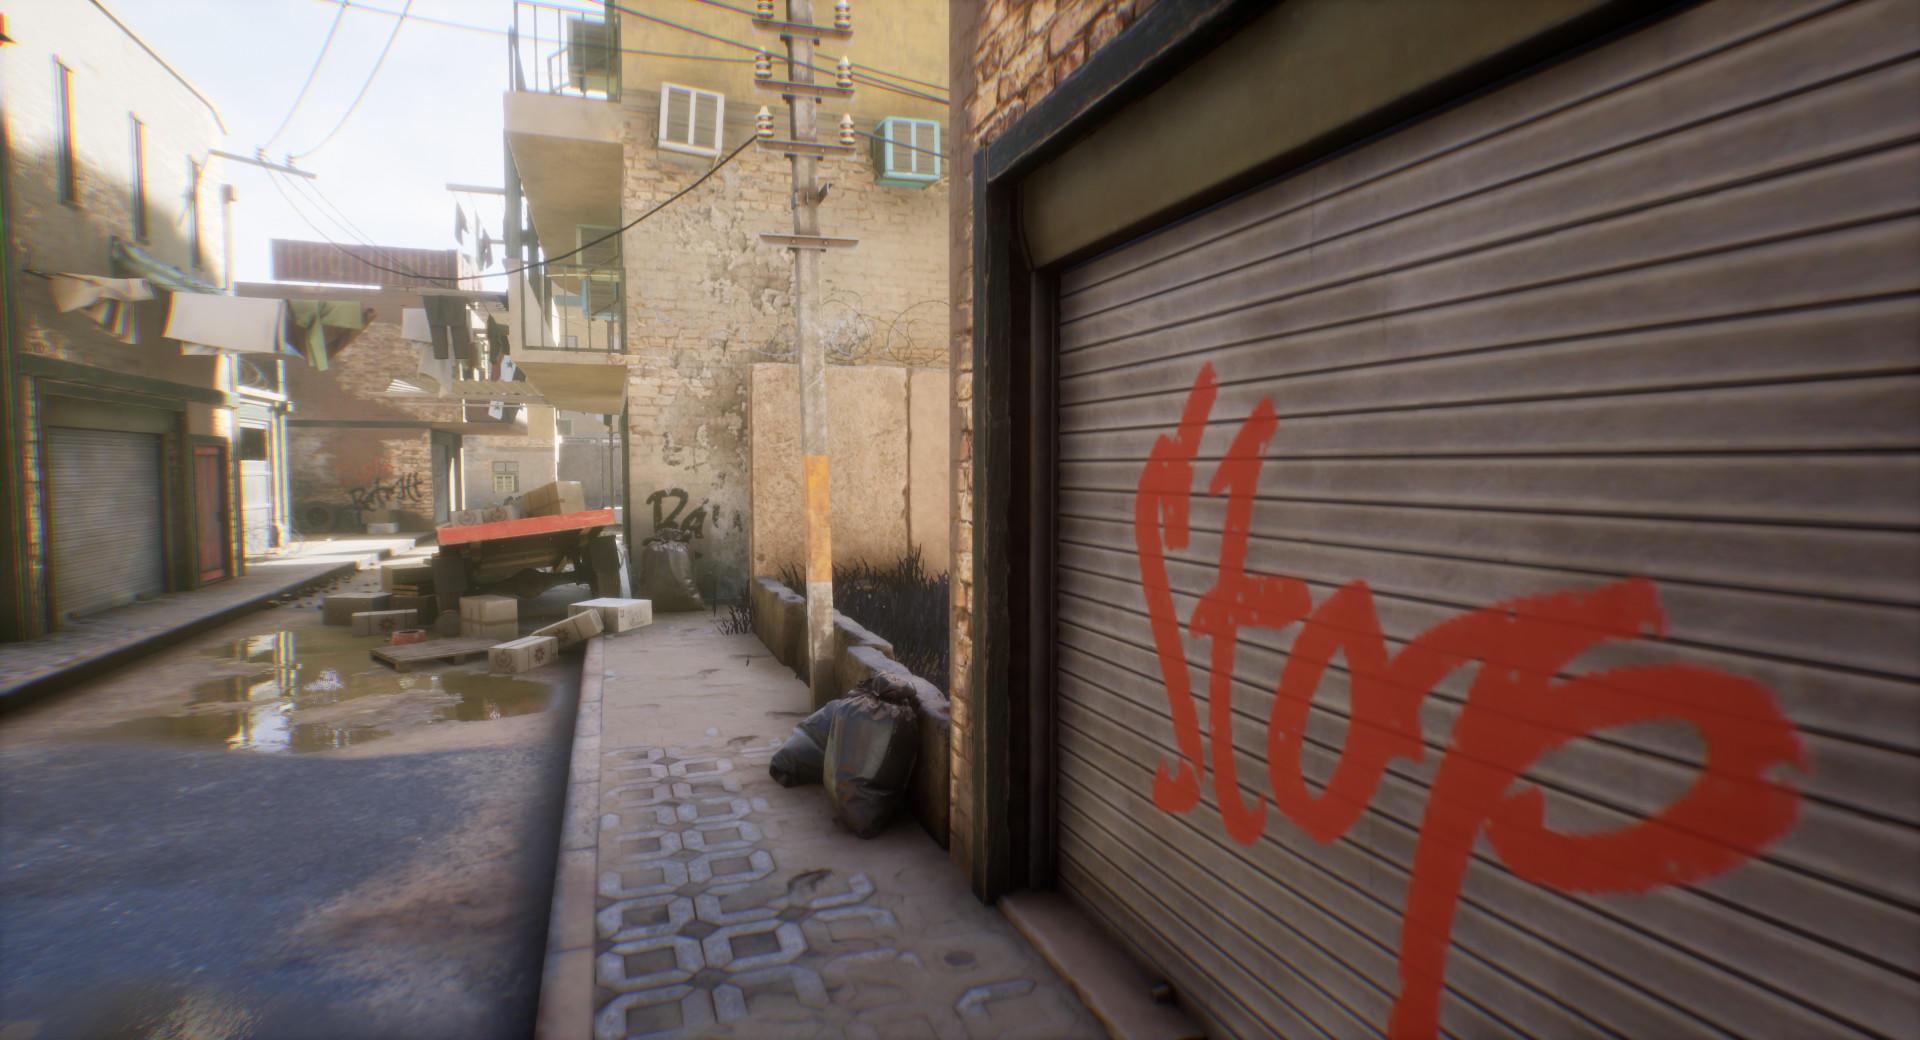 steam五款免费好评游戏推荐